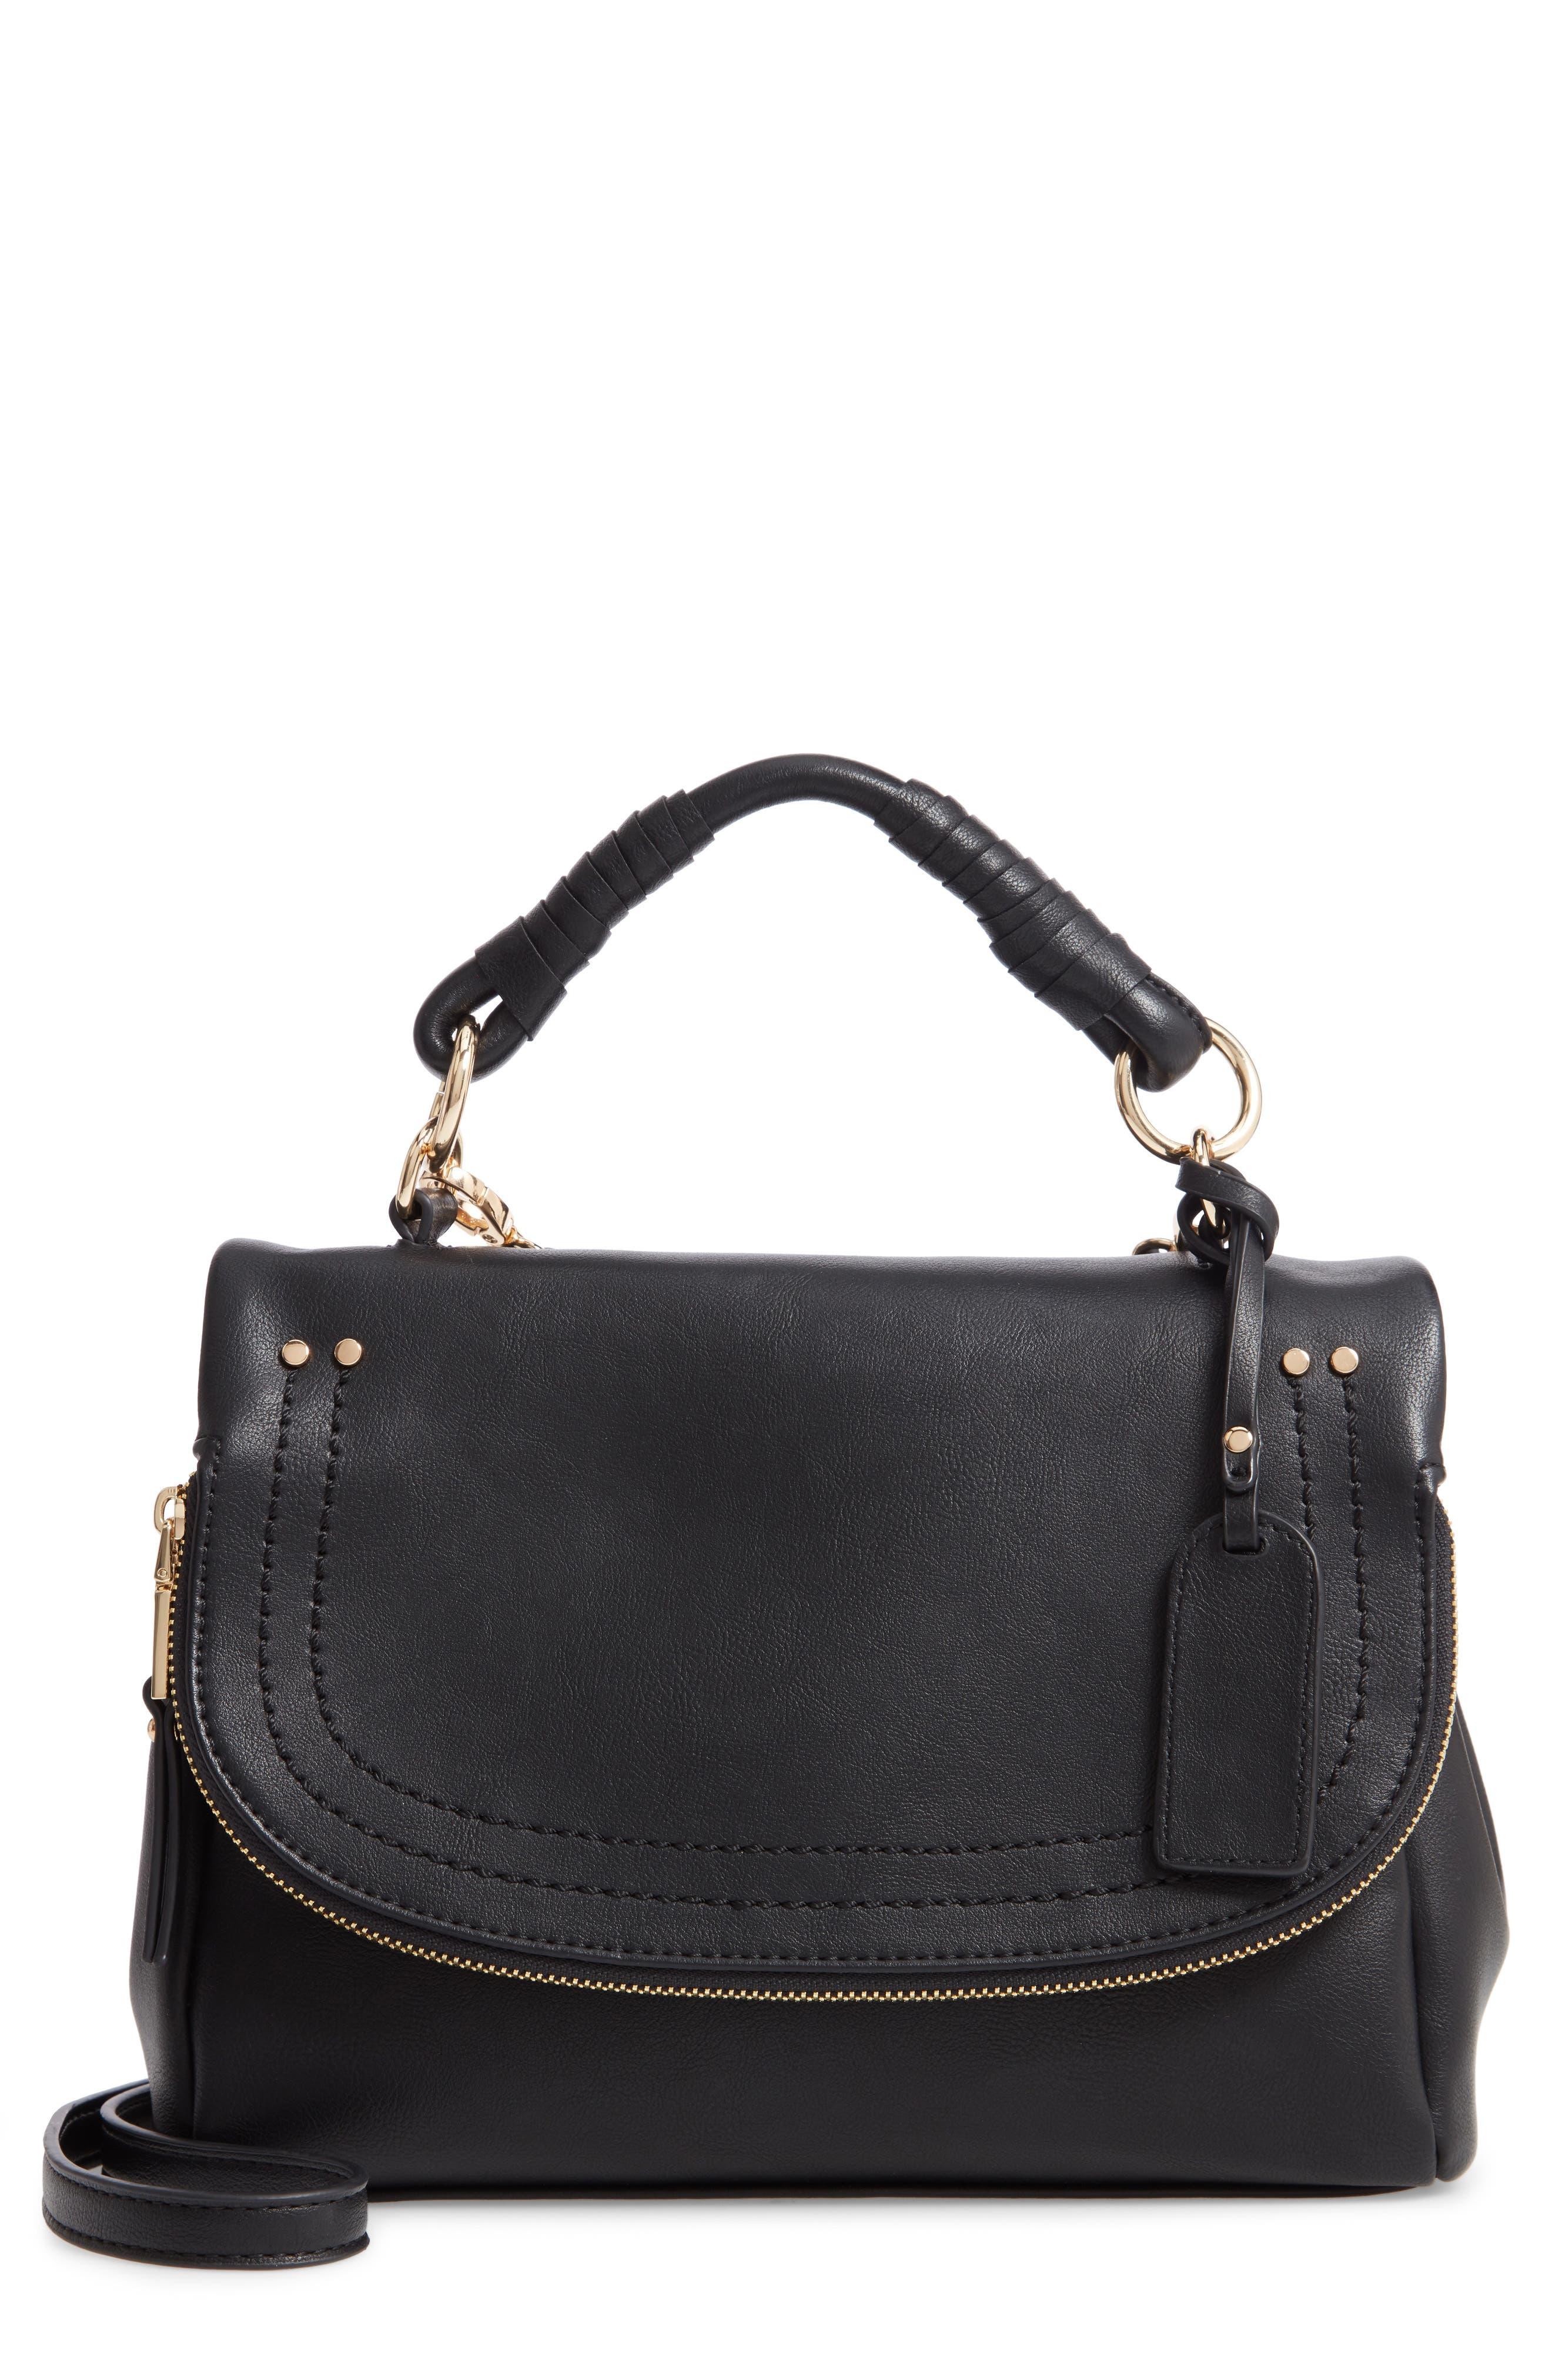 Rubie Faux Leather Crossbody Bag,                             Main thumbnail 1, color,                             BLACK